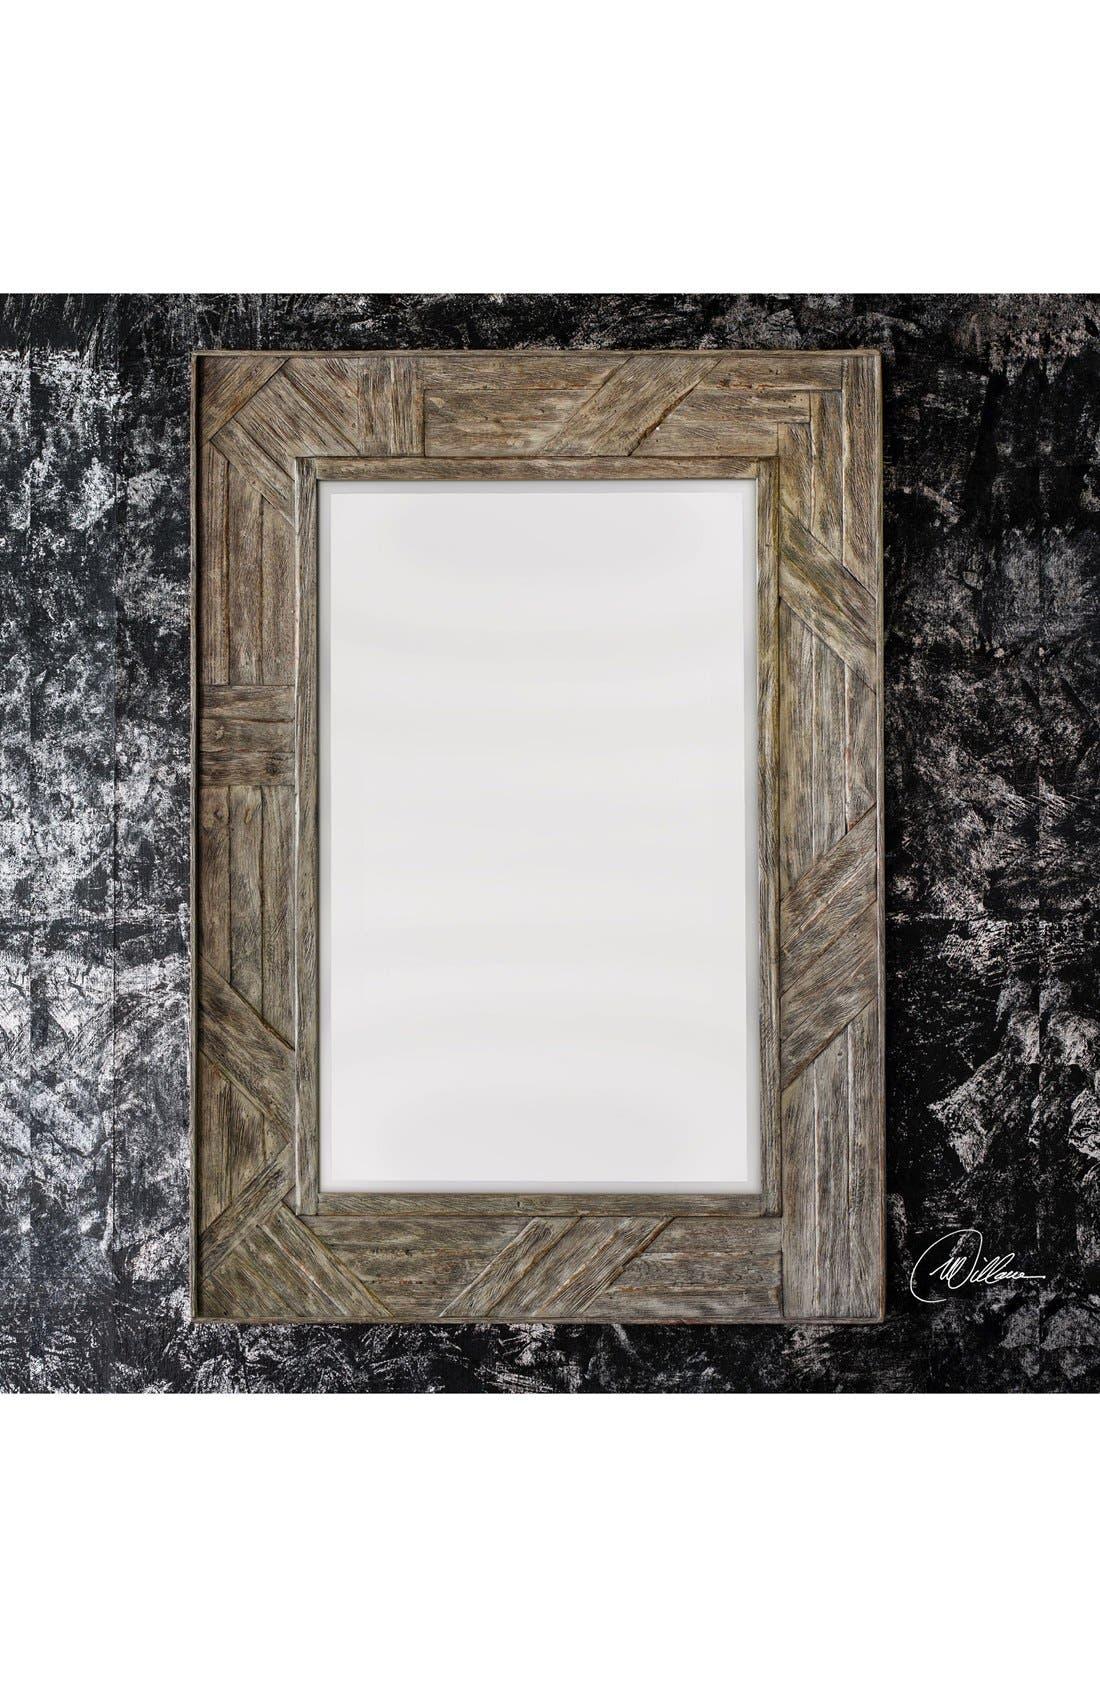 'Fortuo' Mahogany Wood Mirror,                             Alternate thumbnail 2, color,                             200